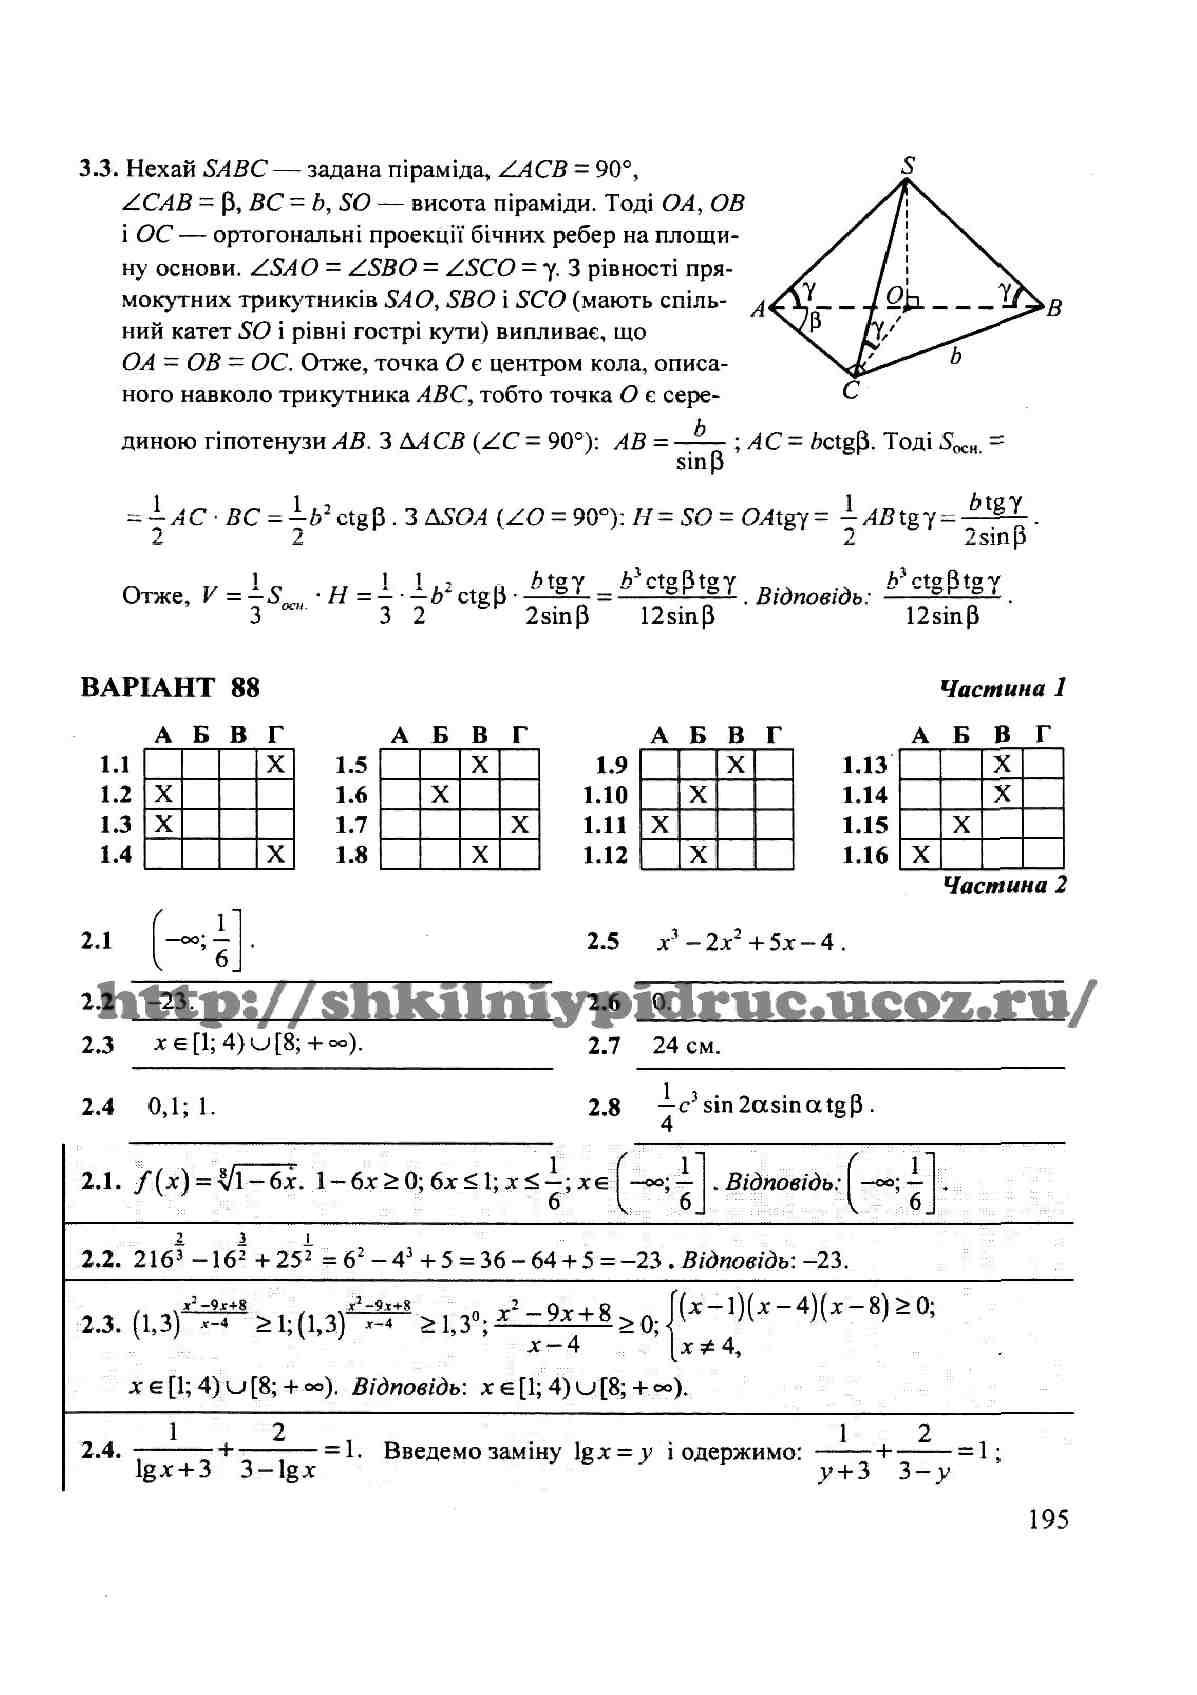 с клас 11 решебник дпа математики